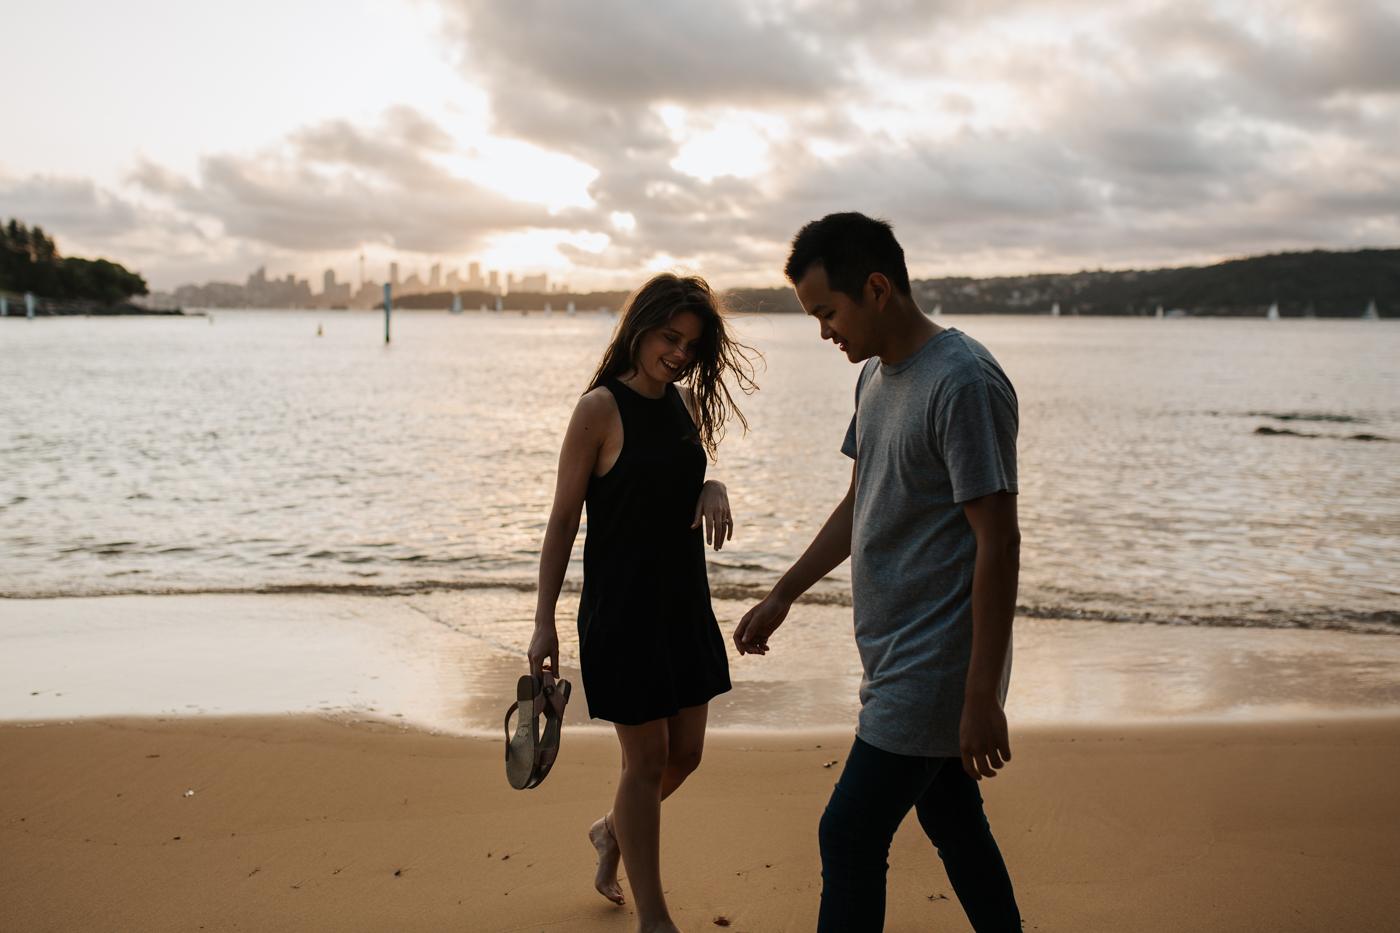 James & Caitie Engagement - Watsons Bay - Samantha Heather Photography-59.jpg